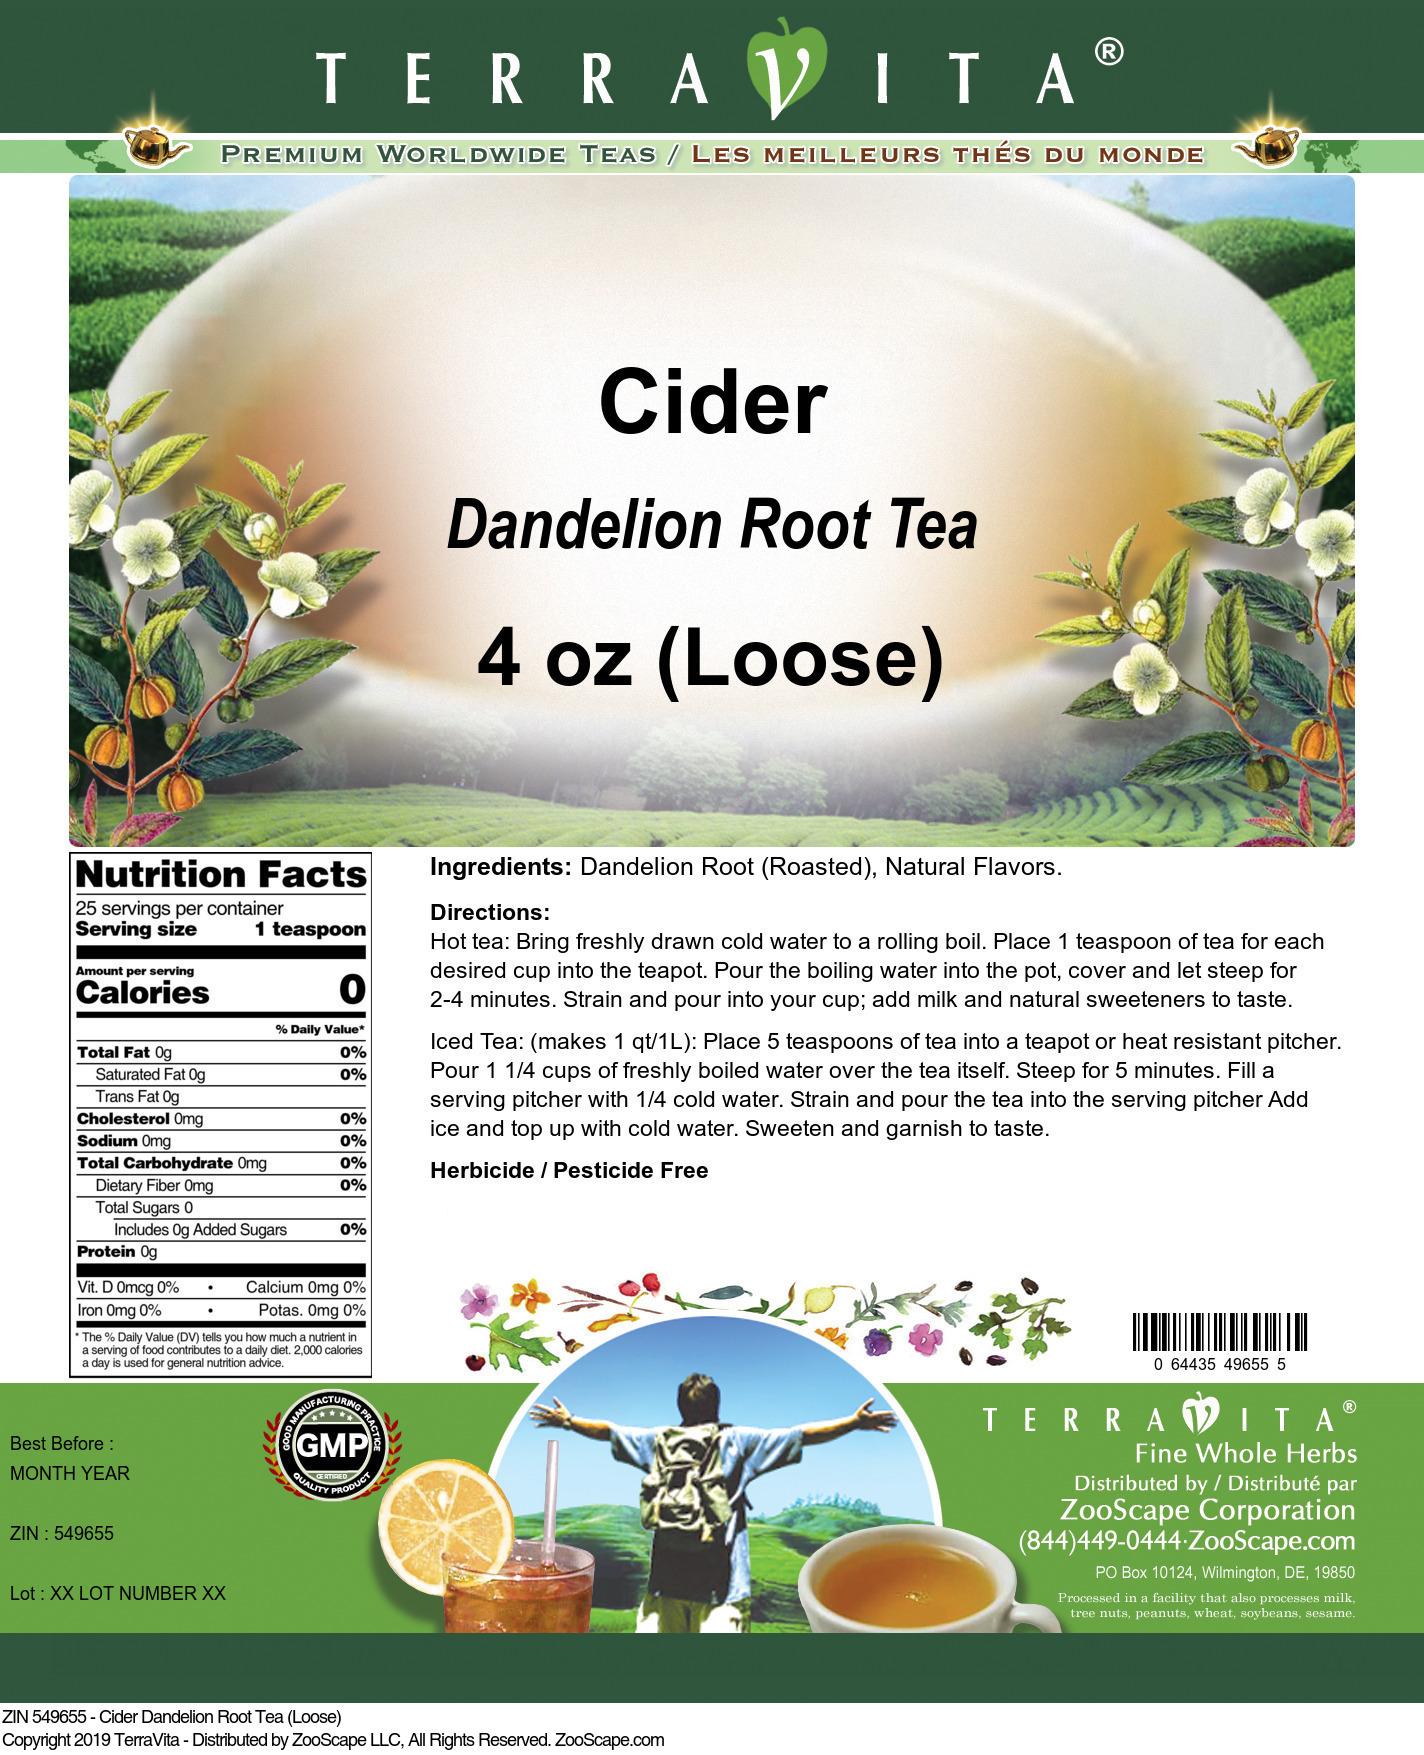 Cider Dandelion Root Tea (Loose)